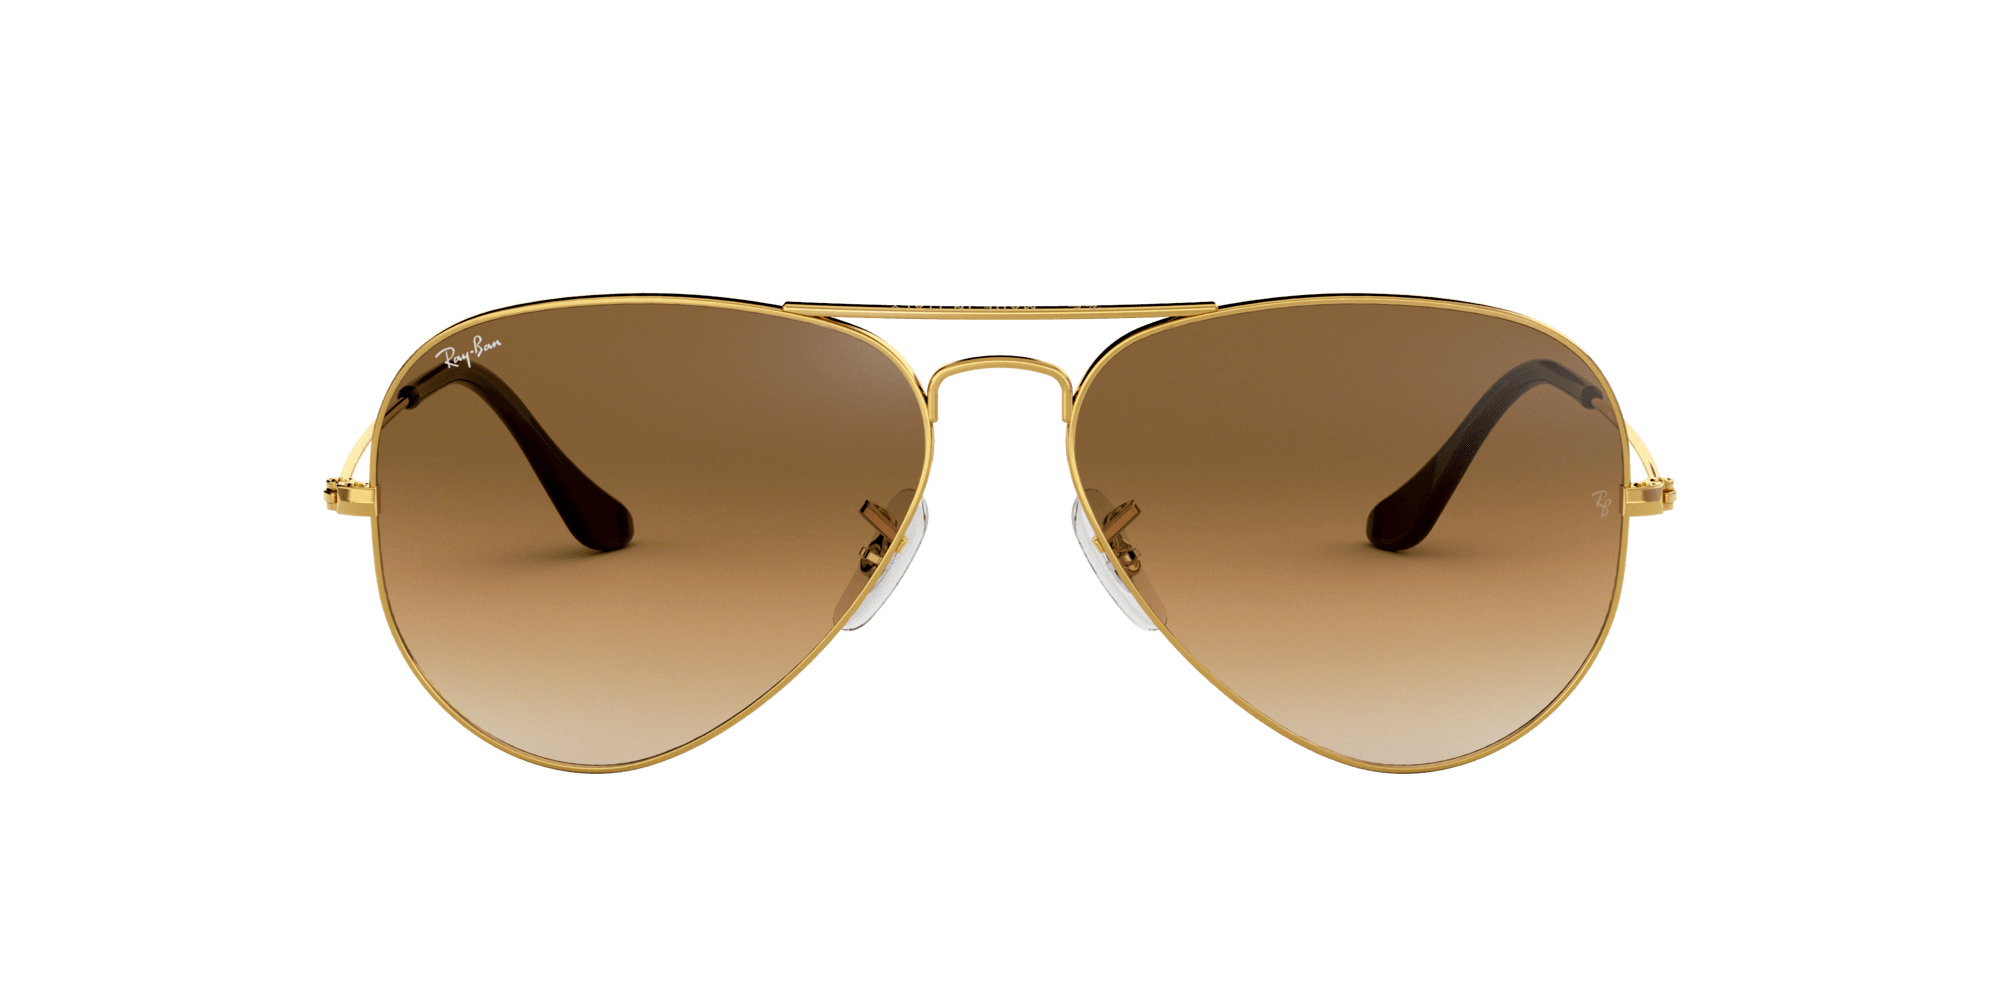 Ray Ban Aviator Small ORB3025 00151 gold Brillen günstig